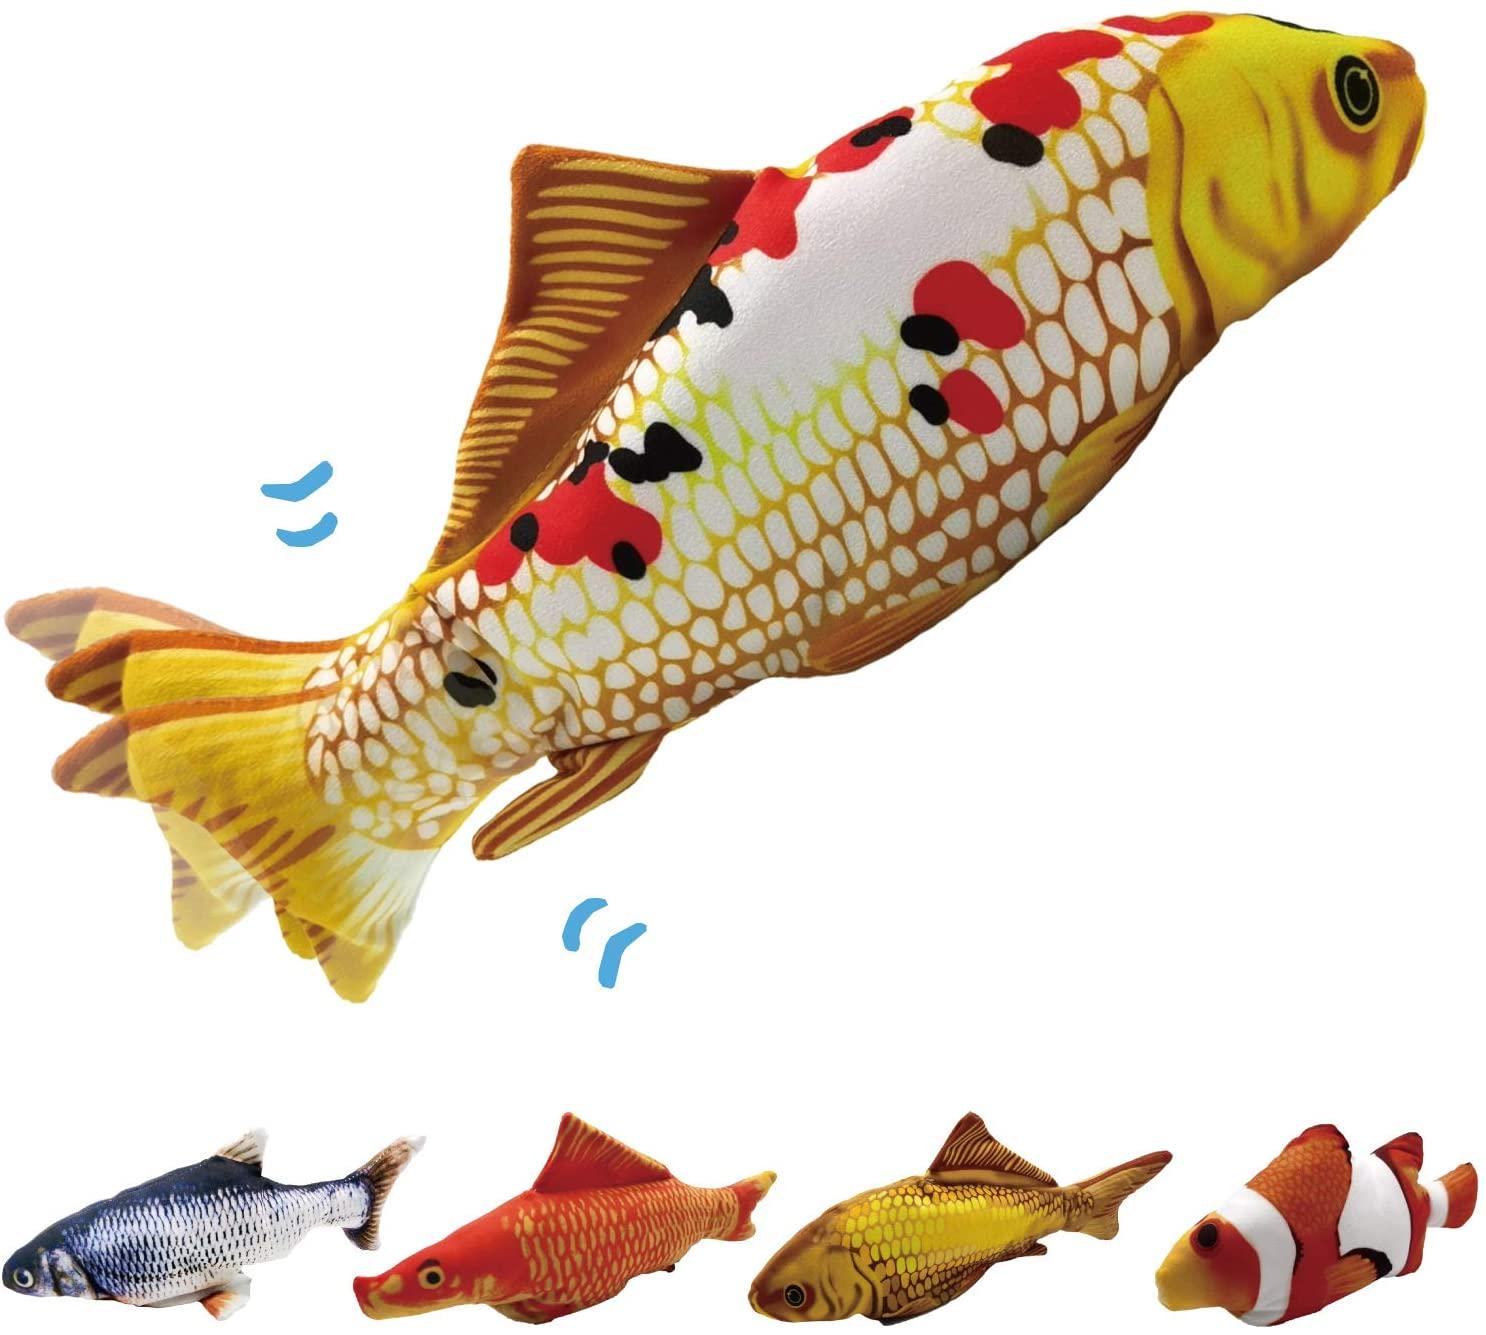 Toydaze Electronic Moving Fish Motion-Activated Plush Interactive Toys for Kids, Funny Self-Flopping Fish Stuffed Animal, Automatic Realistic Wagging Fishy Plushie Toy, KOI Fish, Yamato Nishiki Type